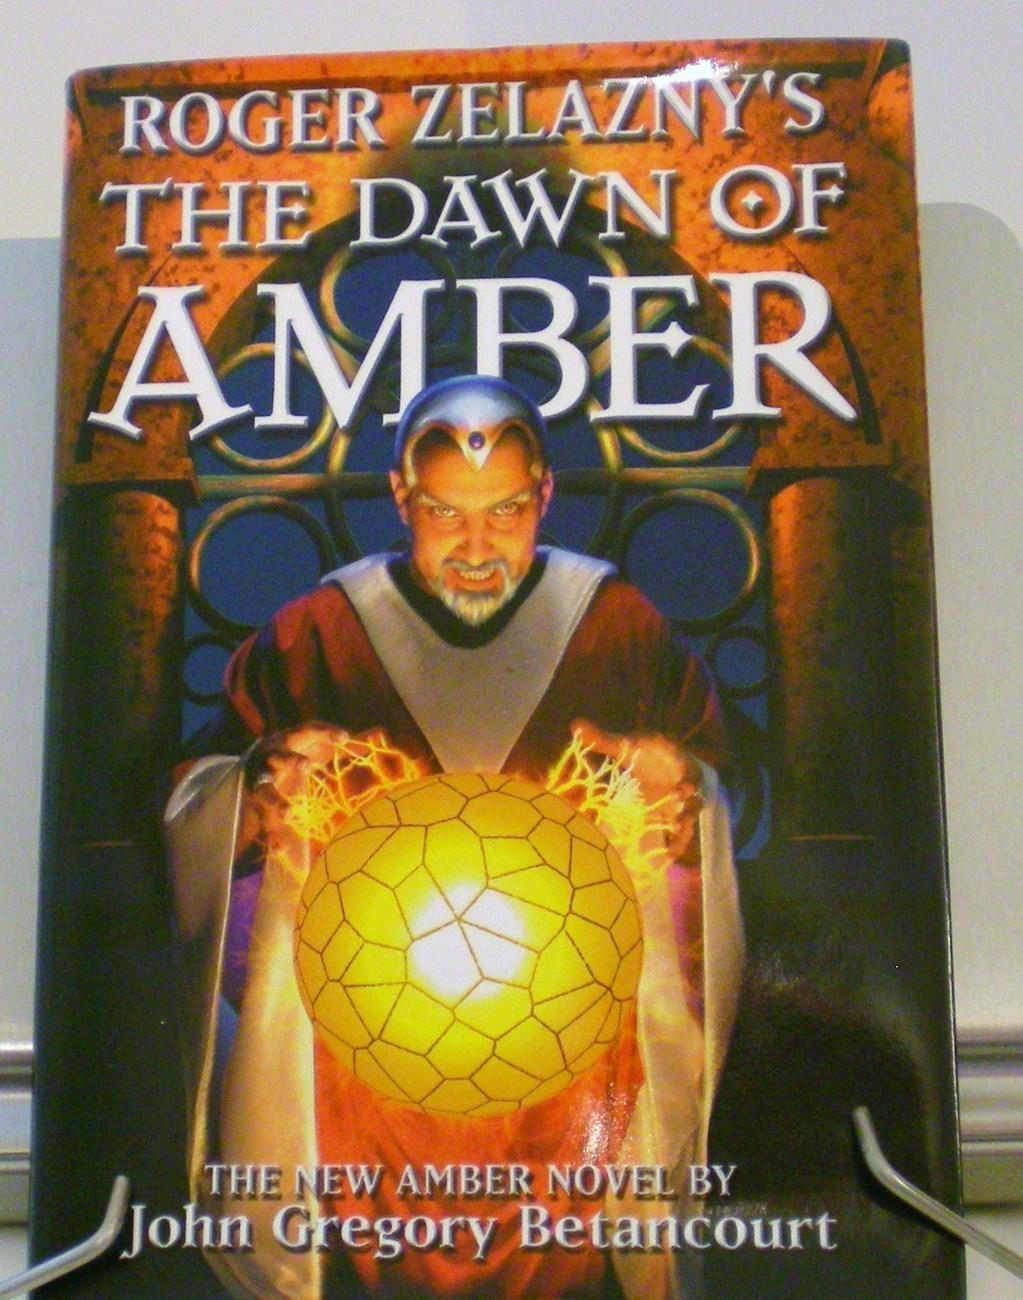 Image 0 of Roger Zelazny's The Dawn of Amber byJohn Gregory Betancourt